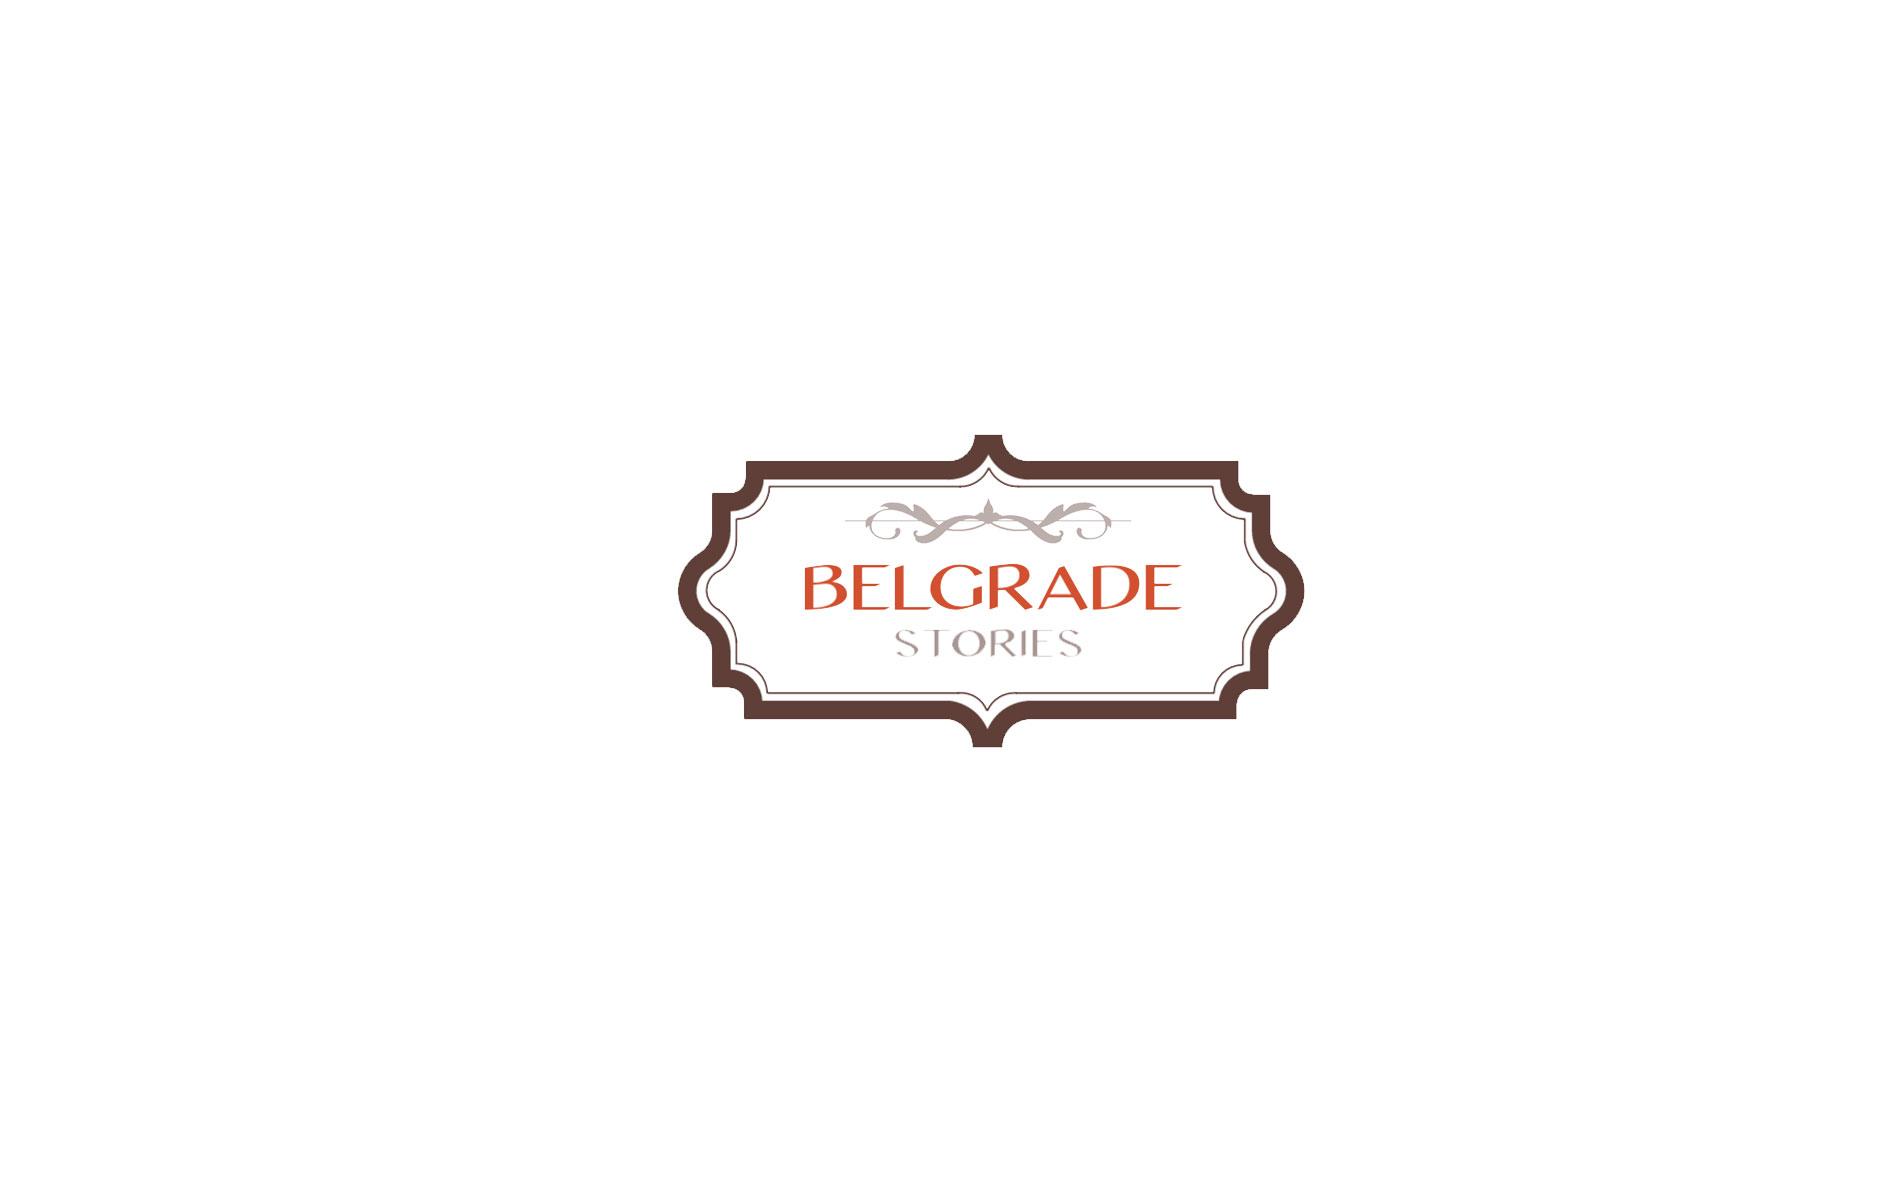 Логотип для агентства городских туров в Белграде фото f_6495893217302f92.jpg